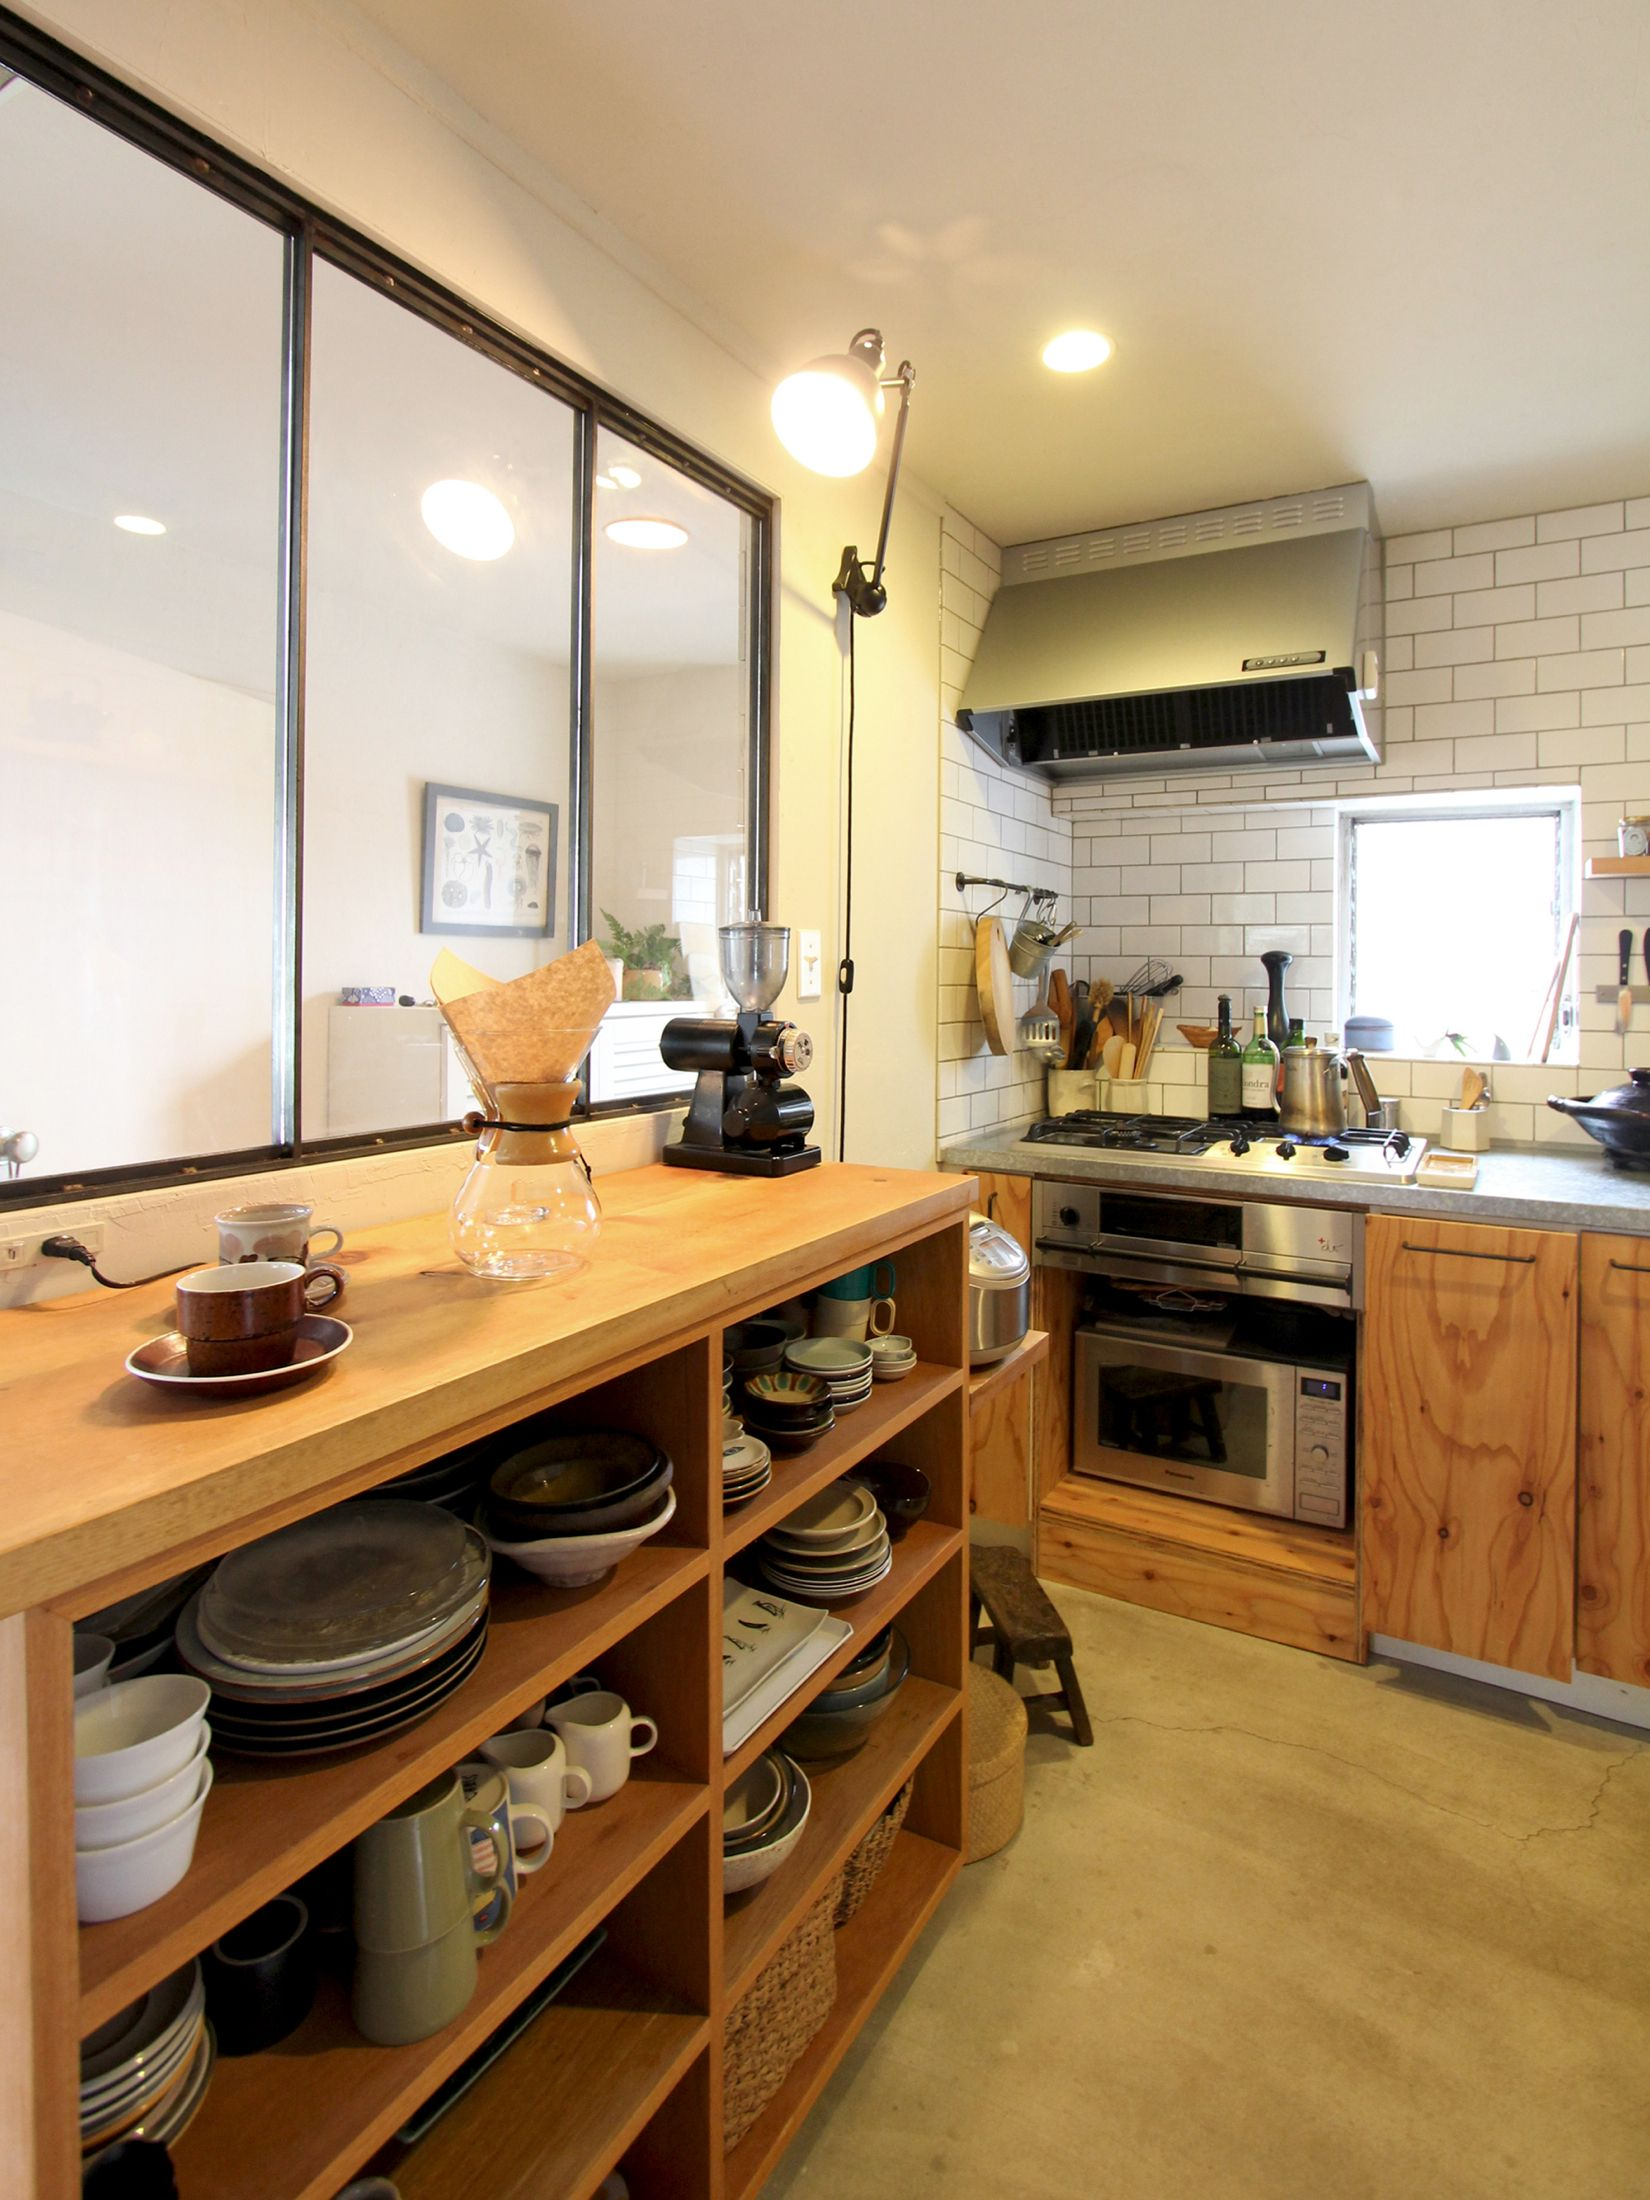 Kitchen Counter Tile Pantry Tile キッチン パントリー タイル ステンレス